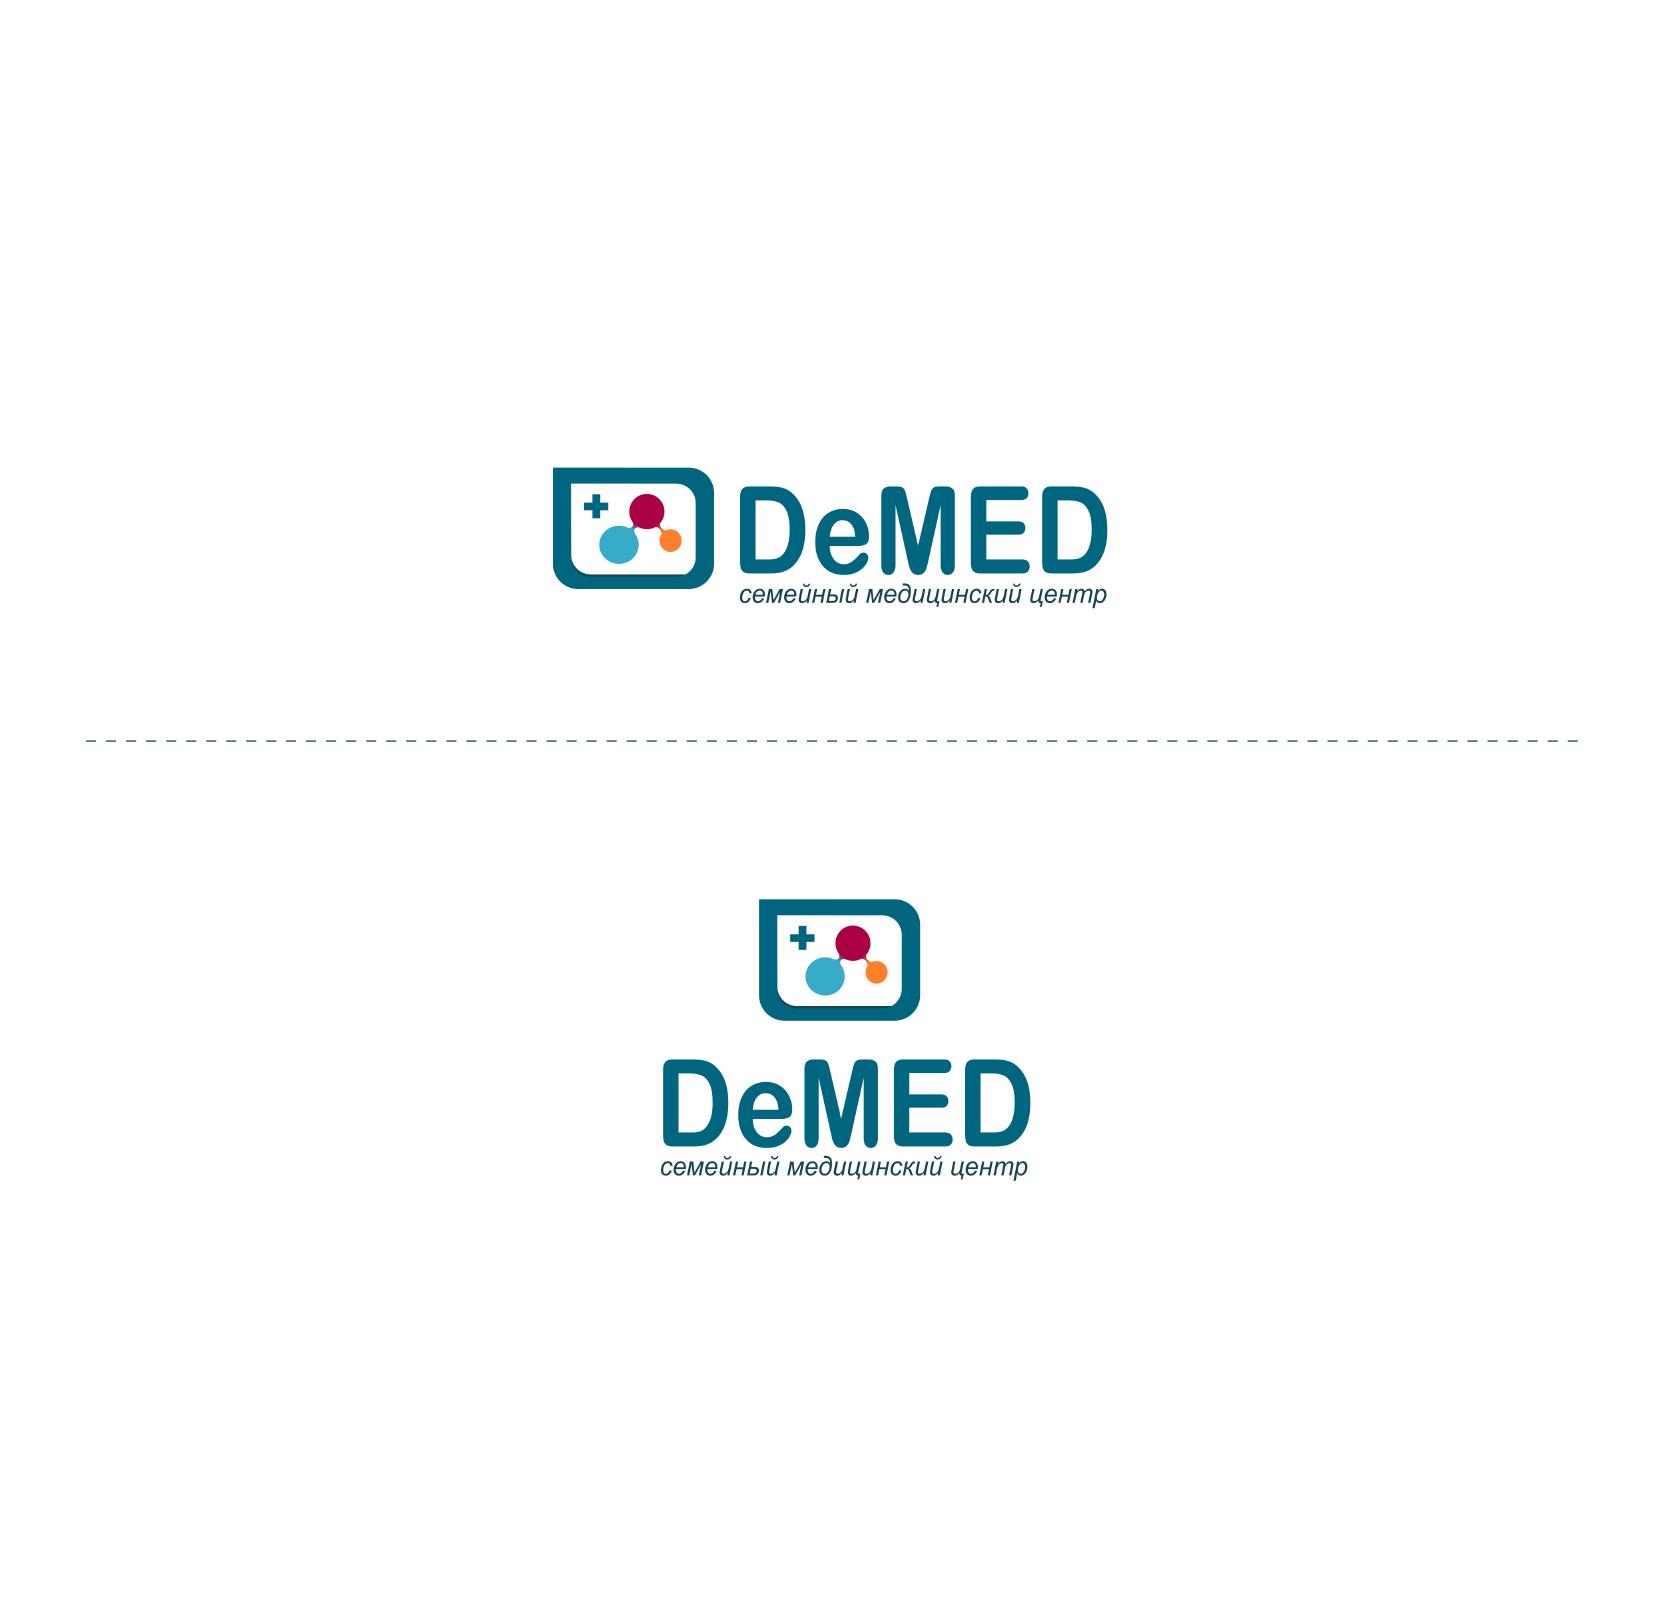 Логотип медицинского центра фото f_8395dc5ab086be2e.jpg